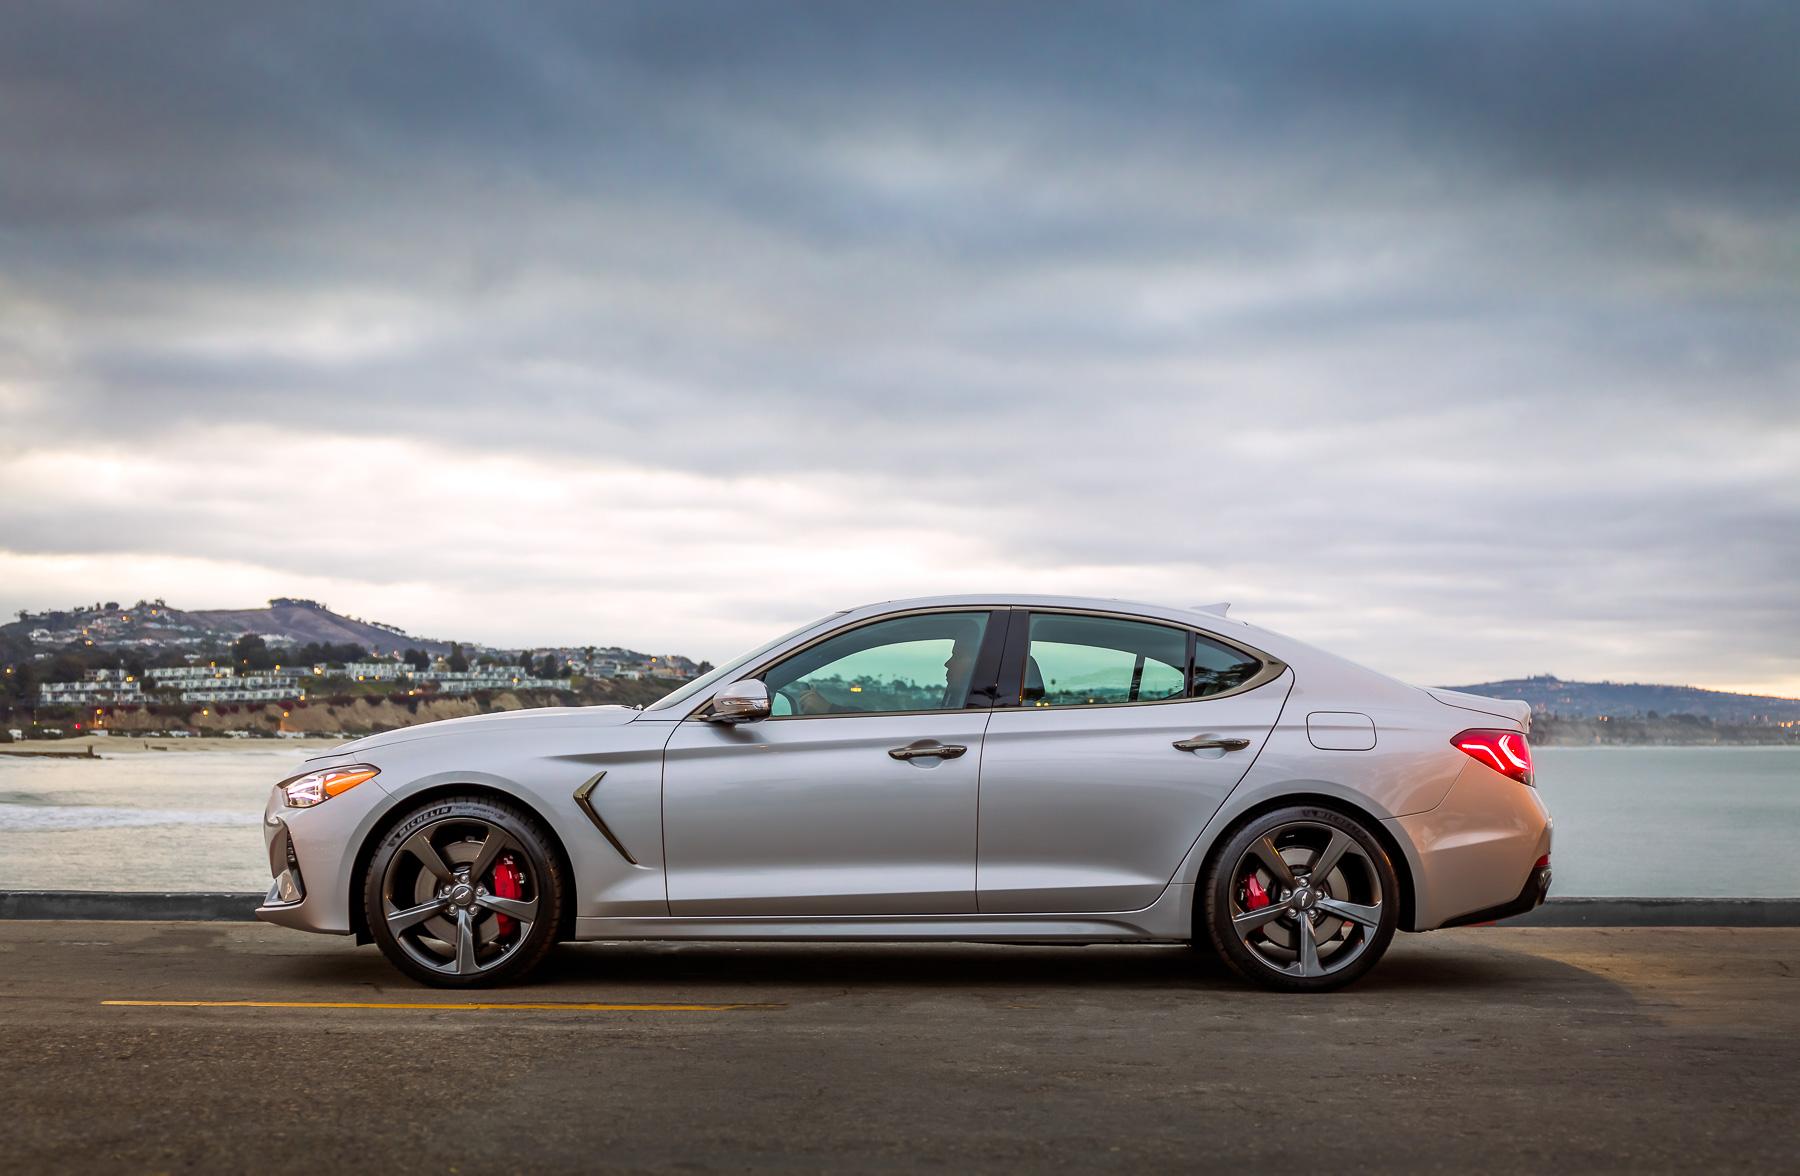 Genesis Unveils 2019 G70 At NYIAS - The Korean Car Blog